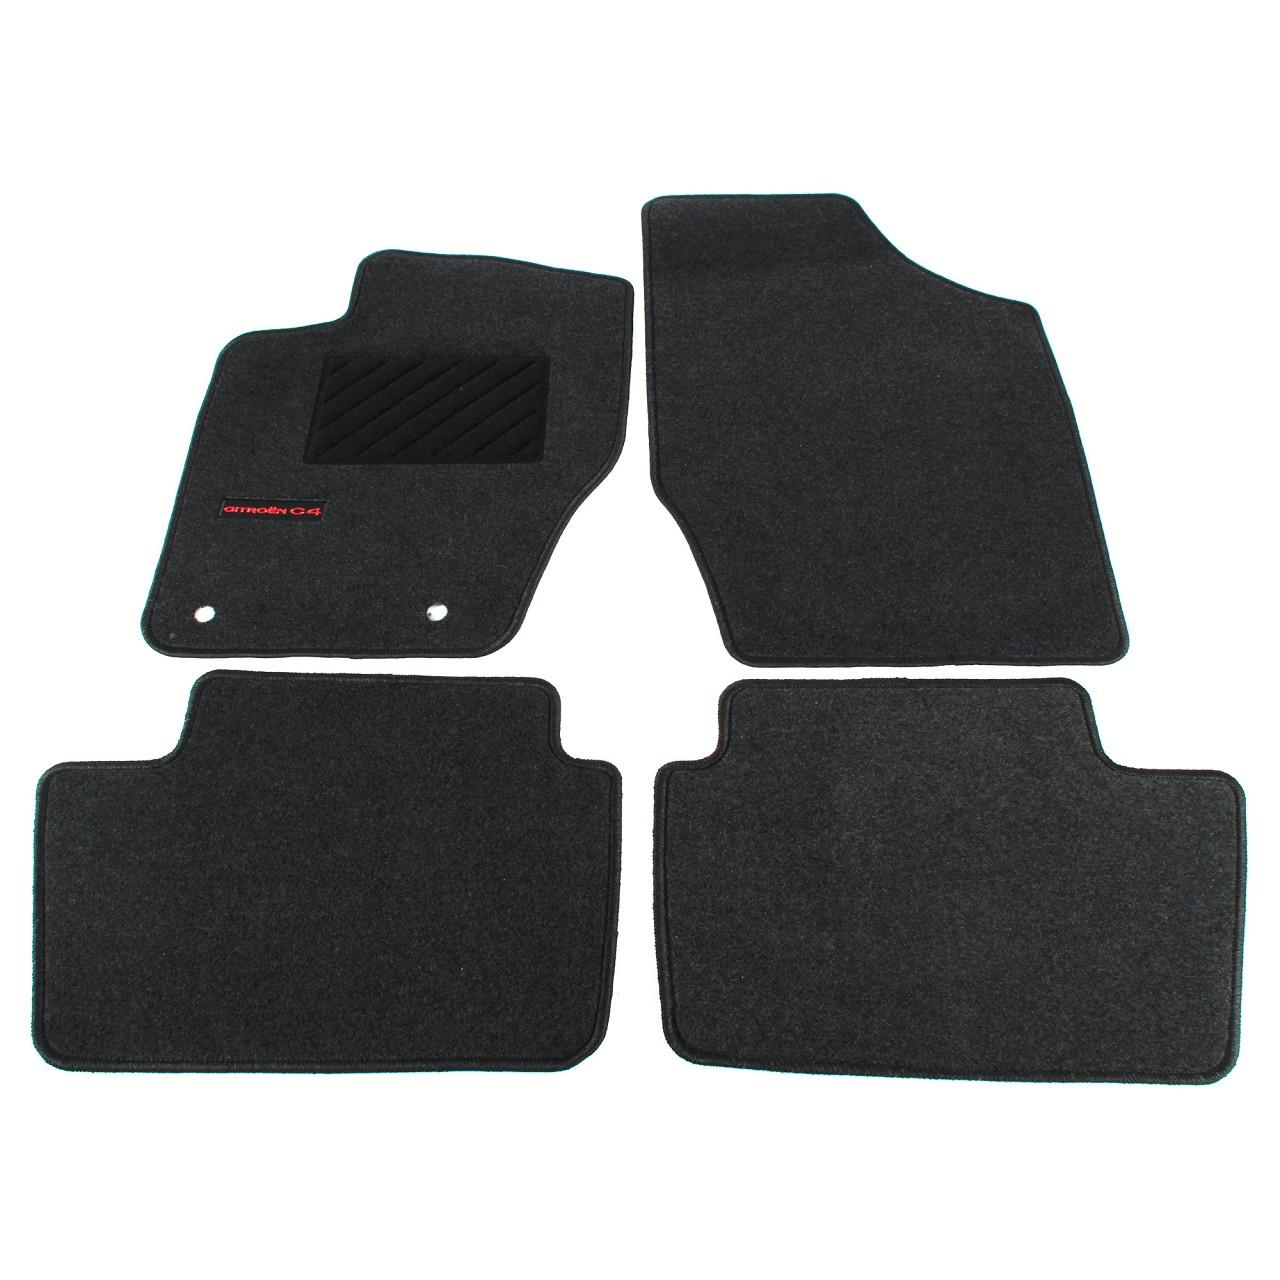 ORIGINAL Citroen Textilmatten Fußmatten Automatten Satz C4 I + C4 COUPE 9464.Q1